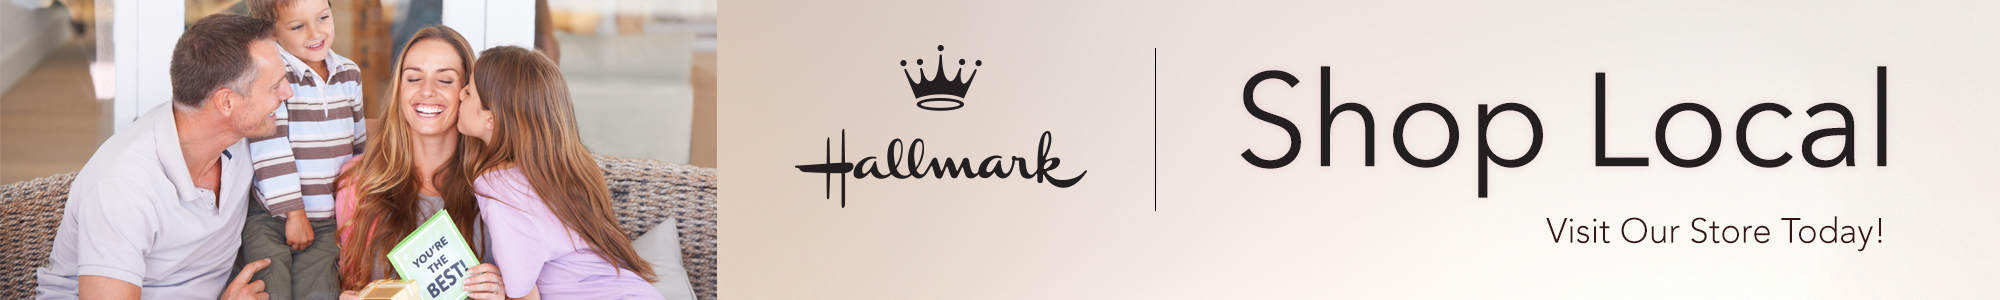 Hallmark - Shop Local